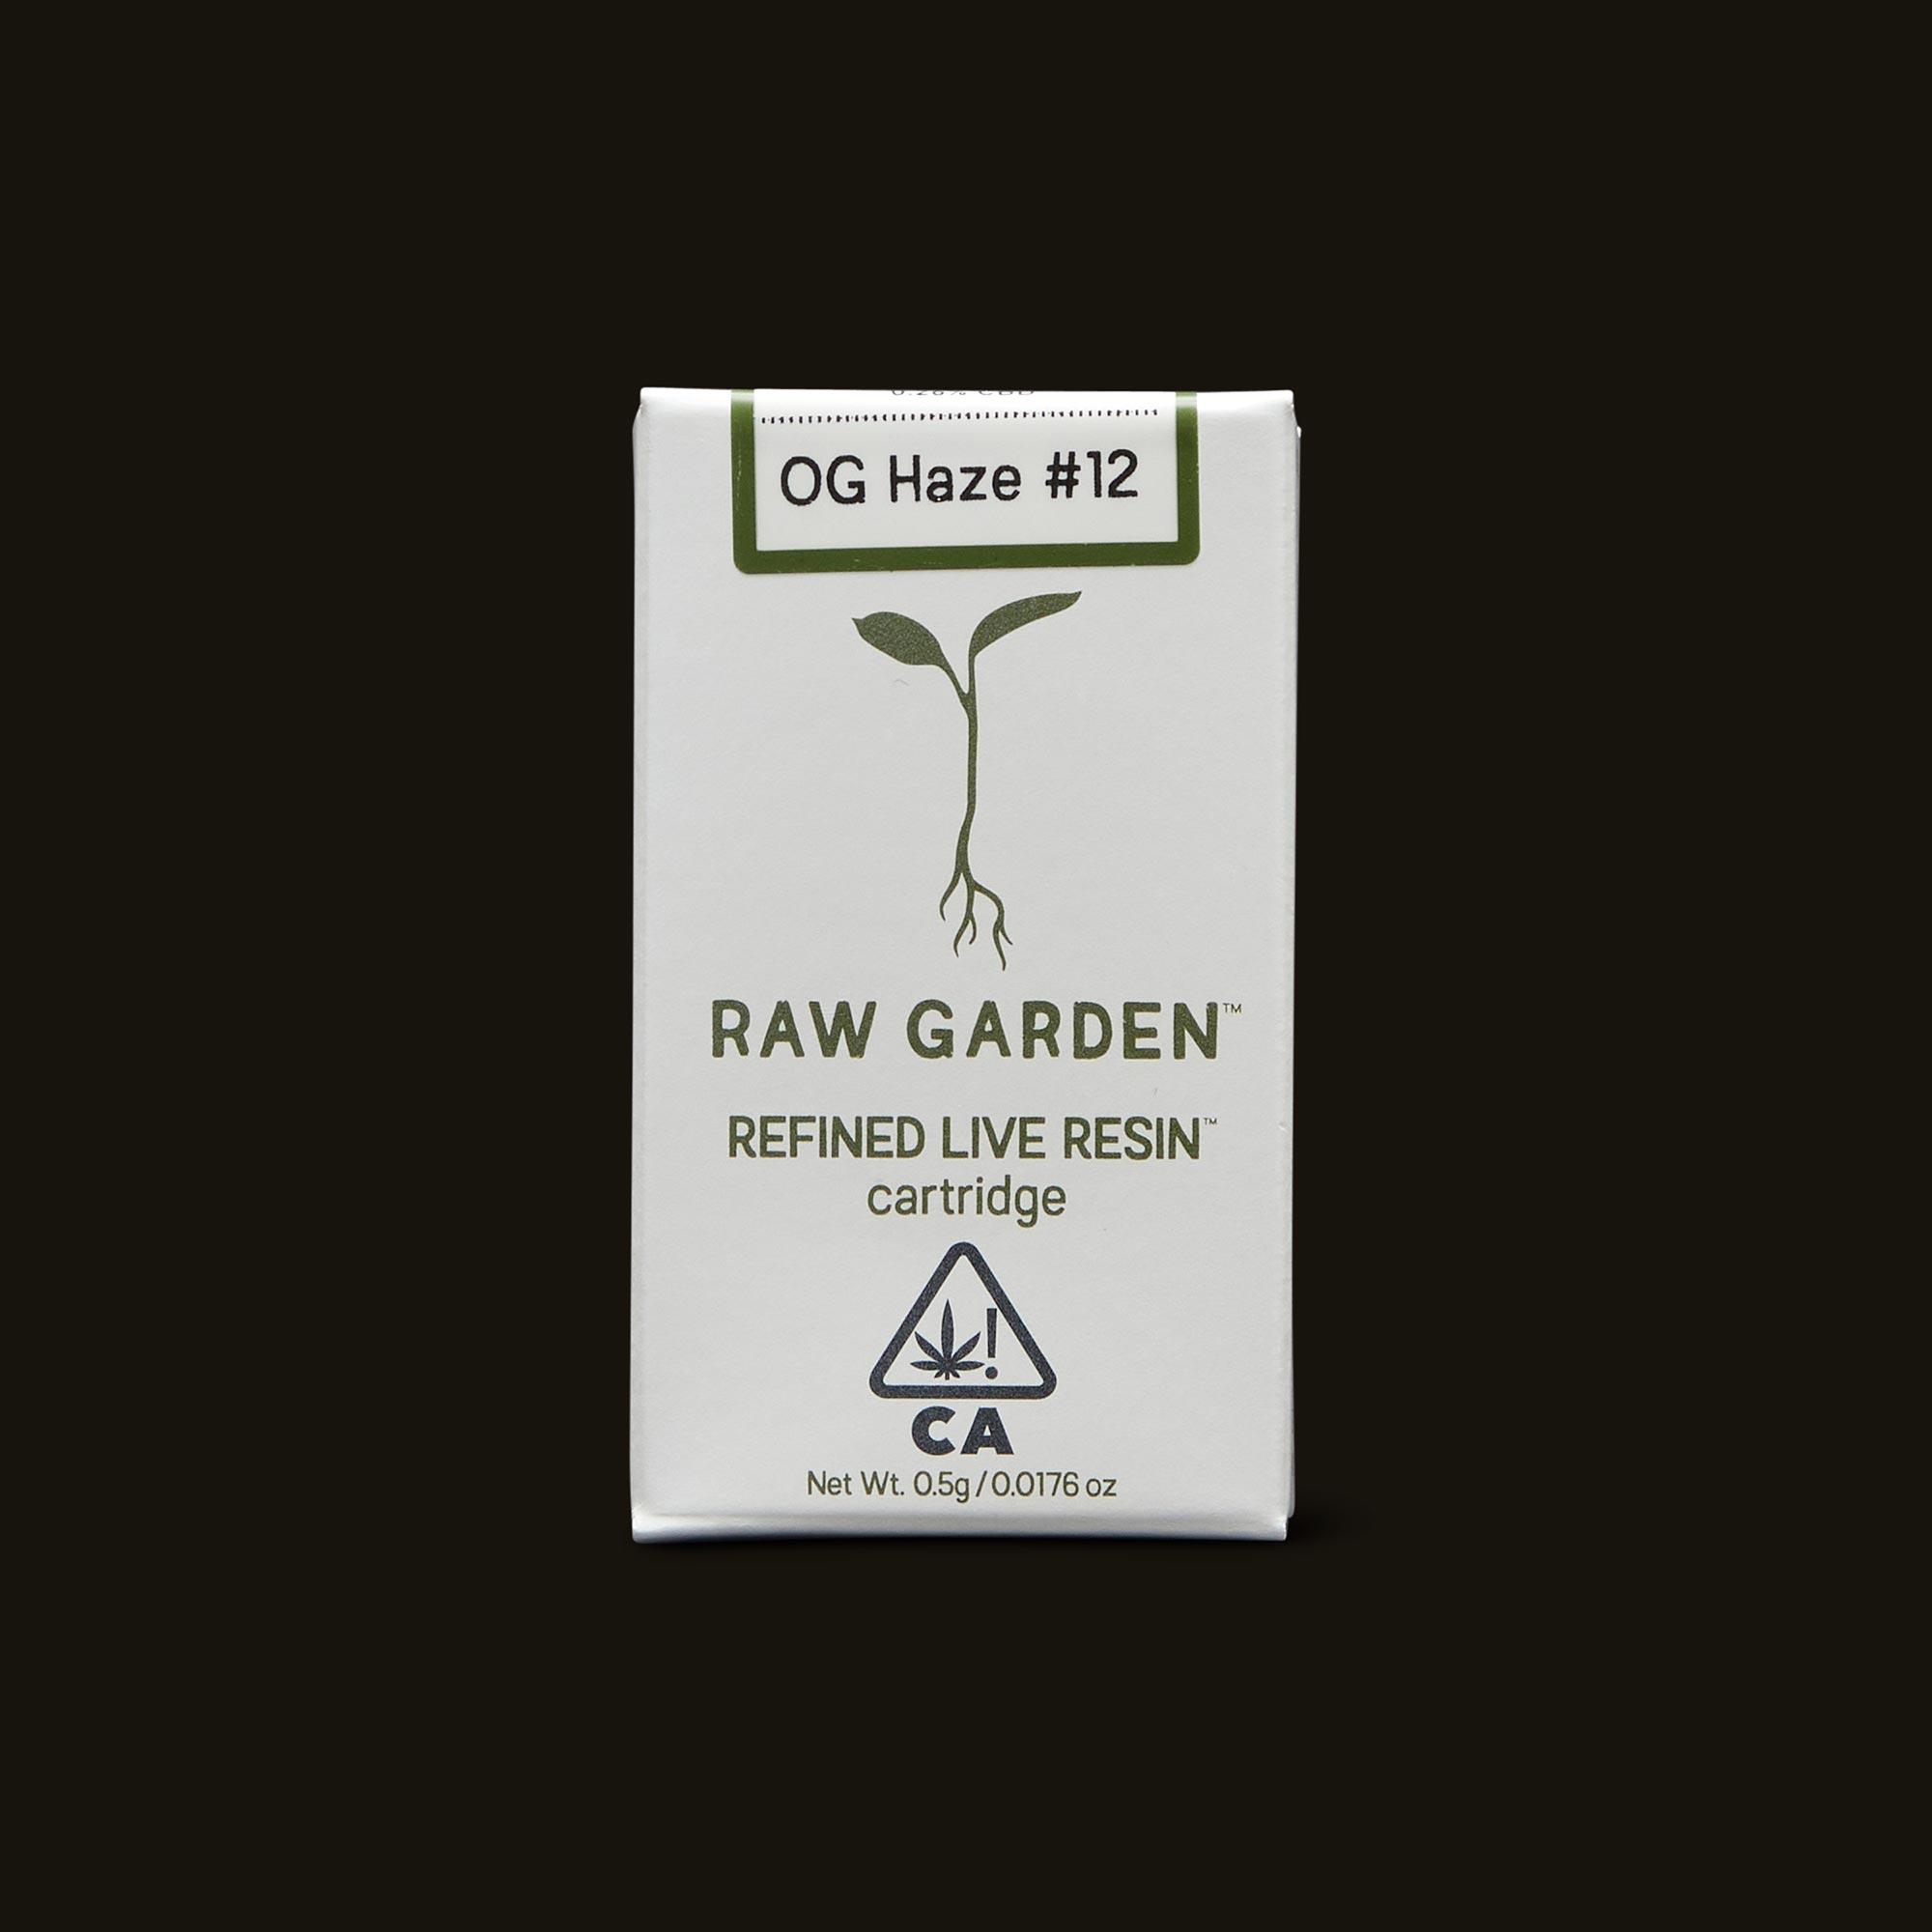 OG Haze #12 Cartridge - 500mg cartridge